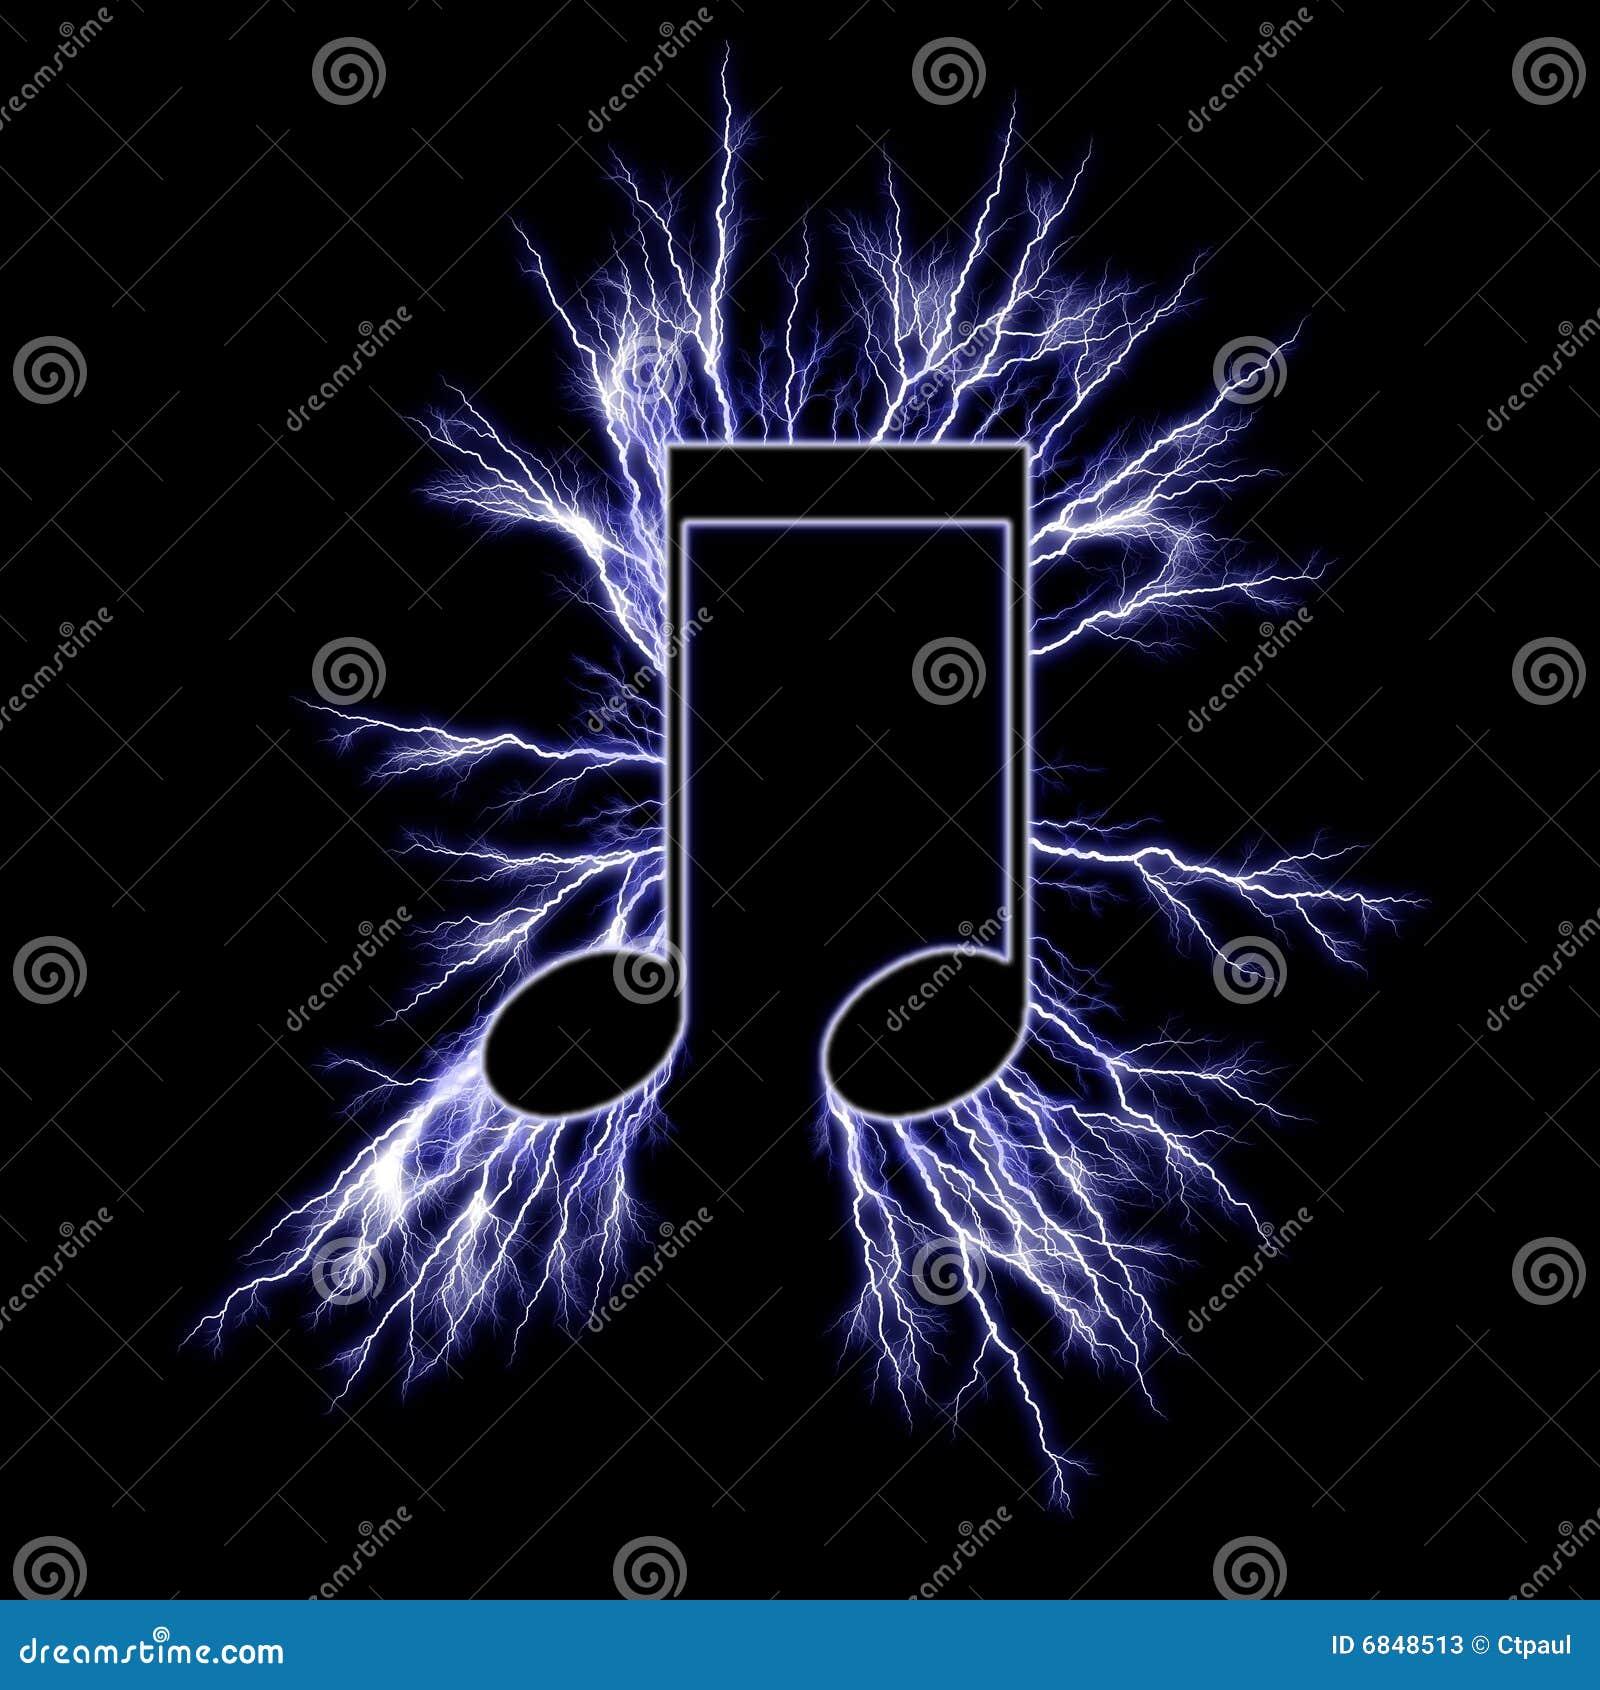 music electric symbol power dreamstime